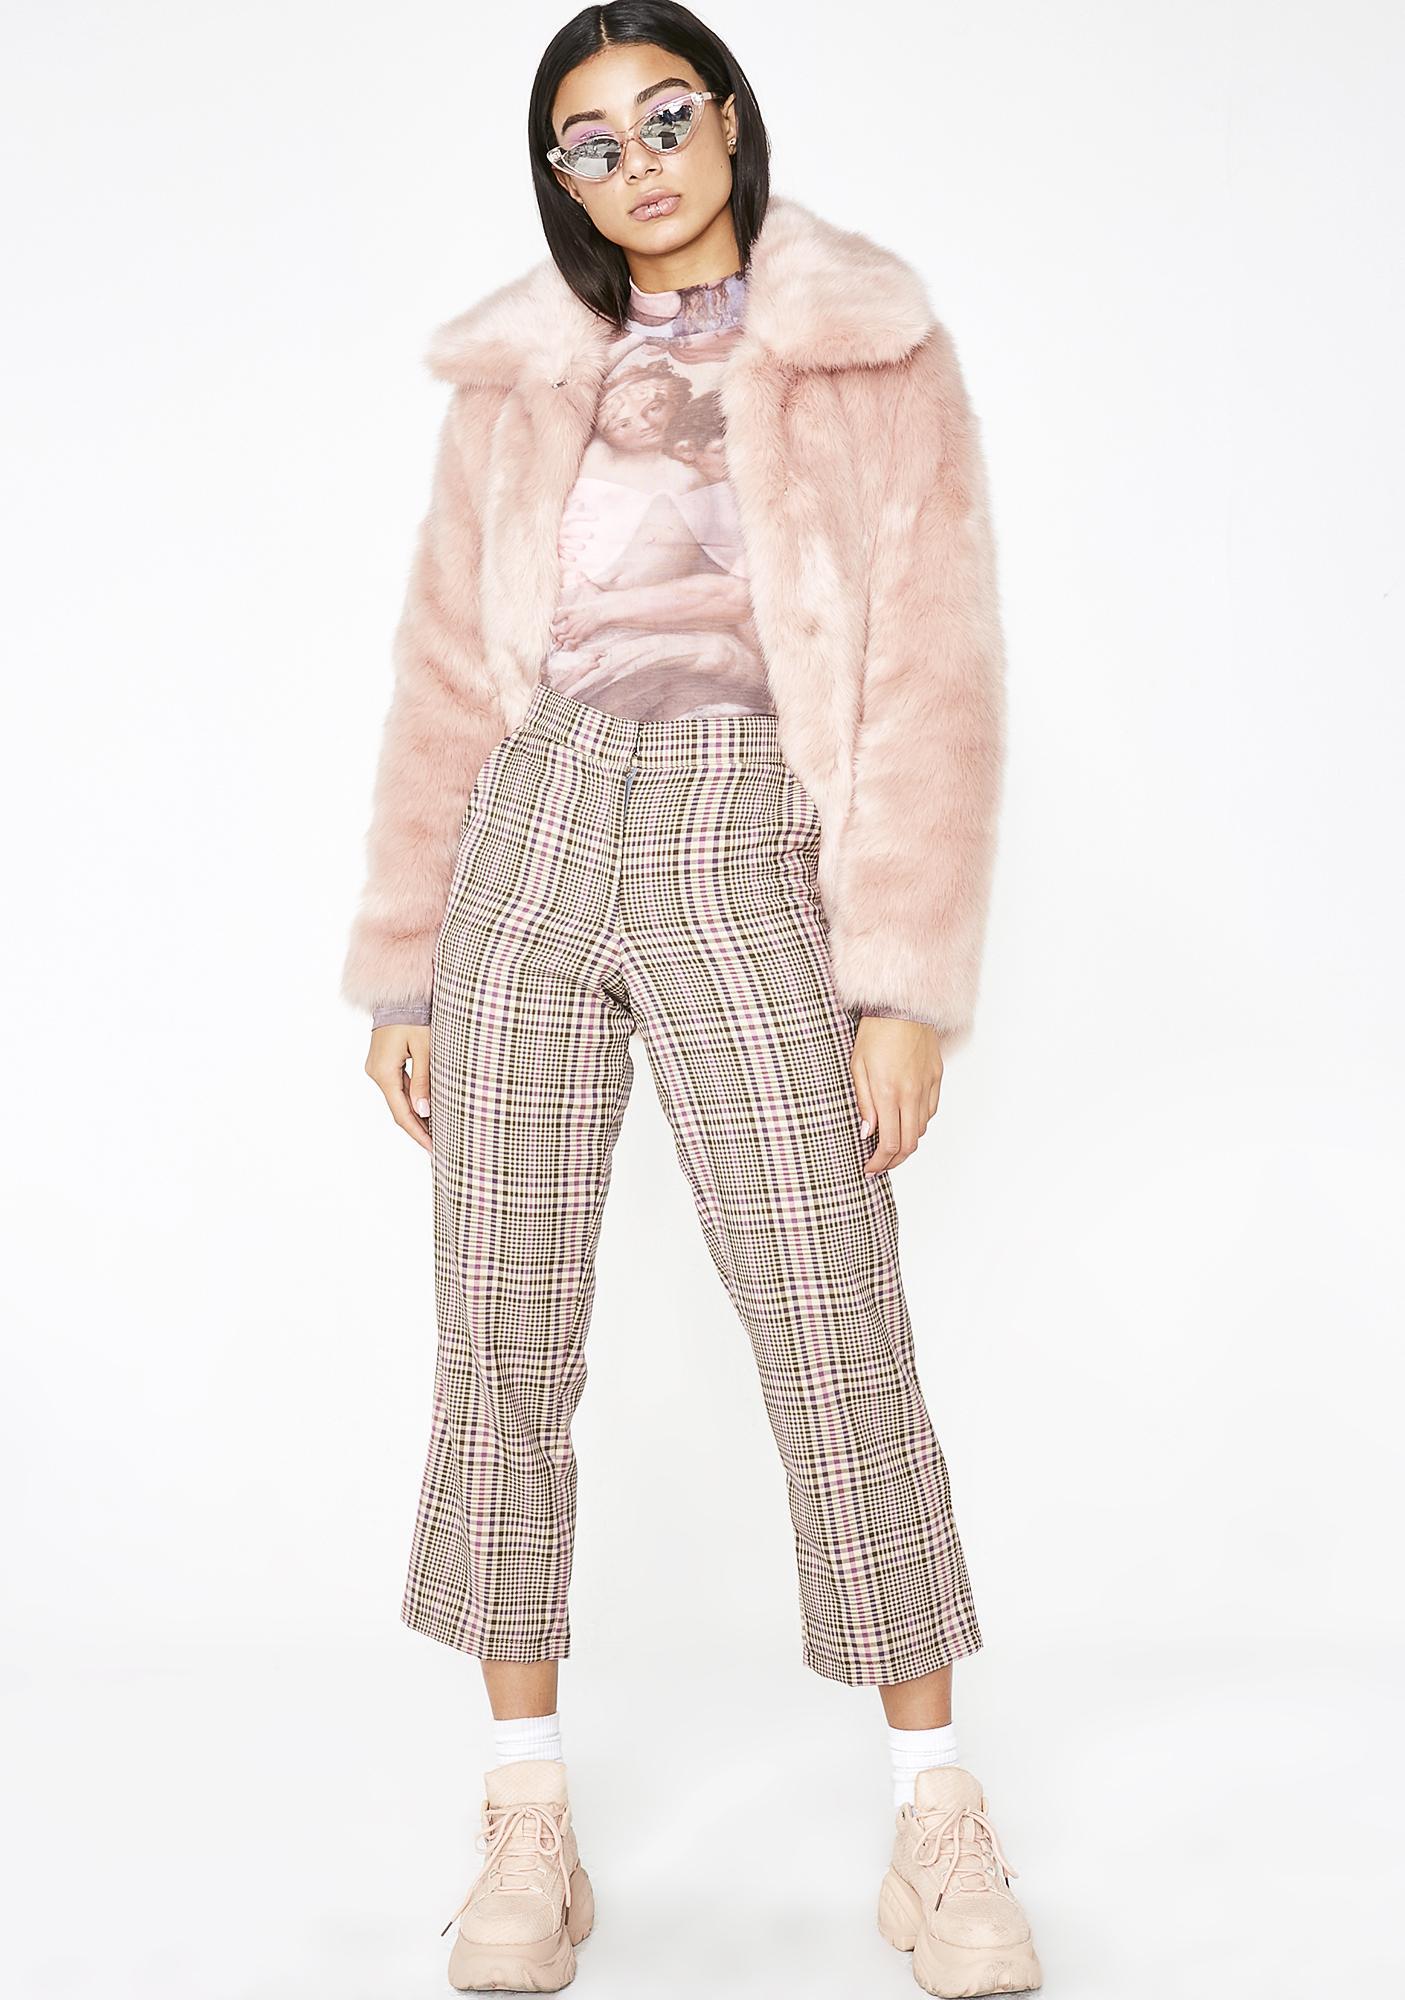 Tach Clothing Lorna Plaid Pant